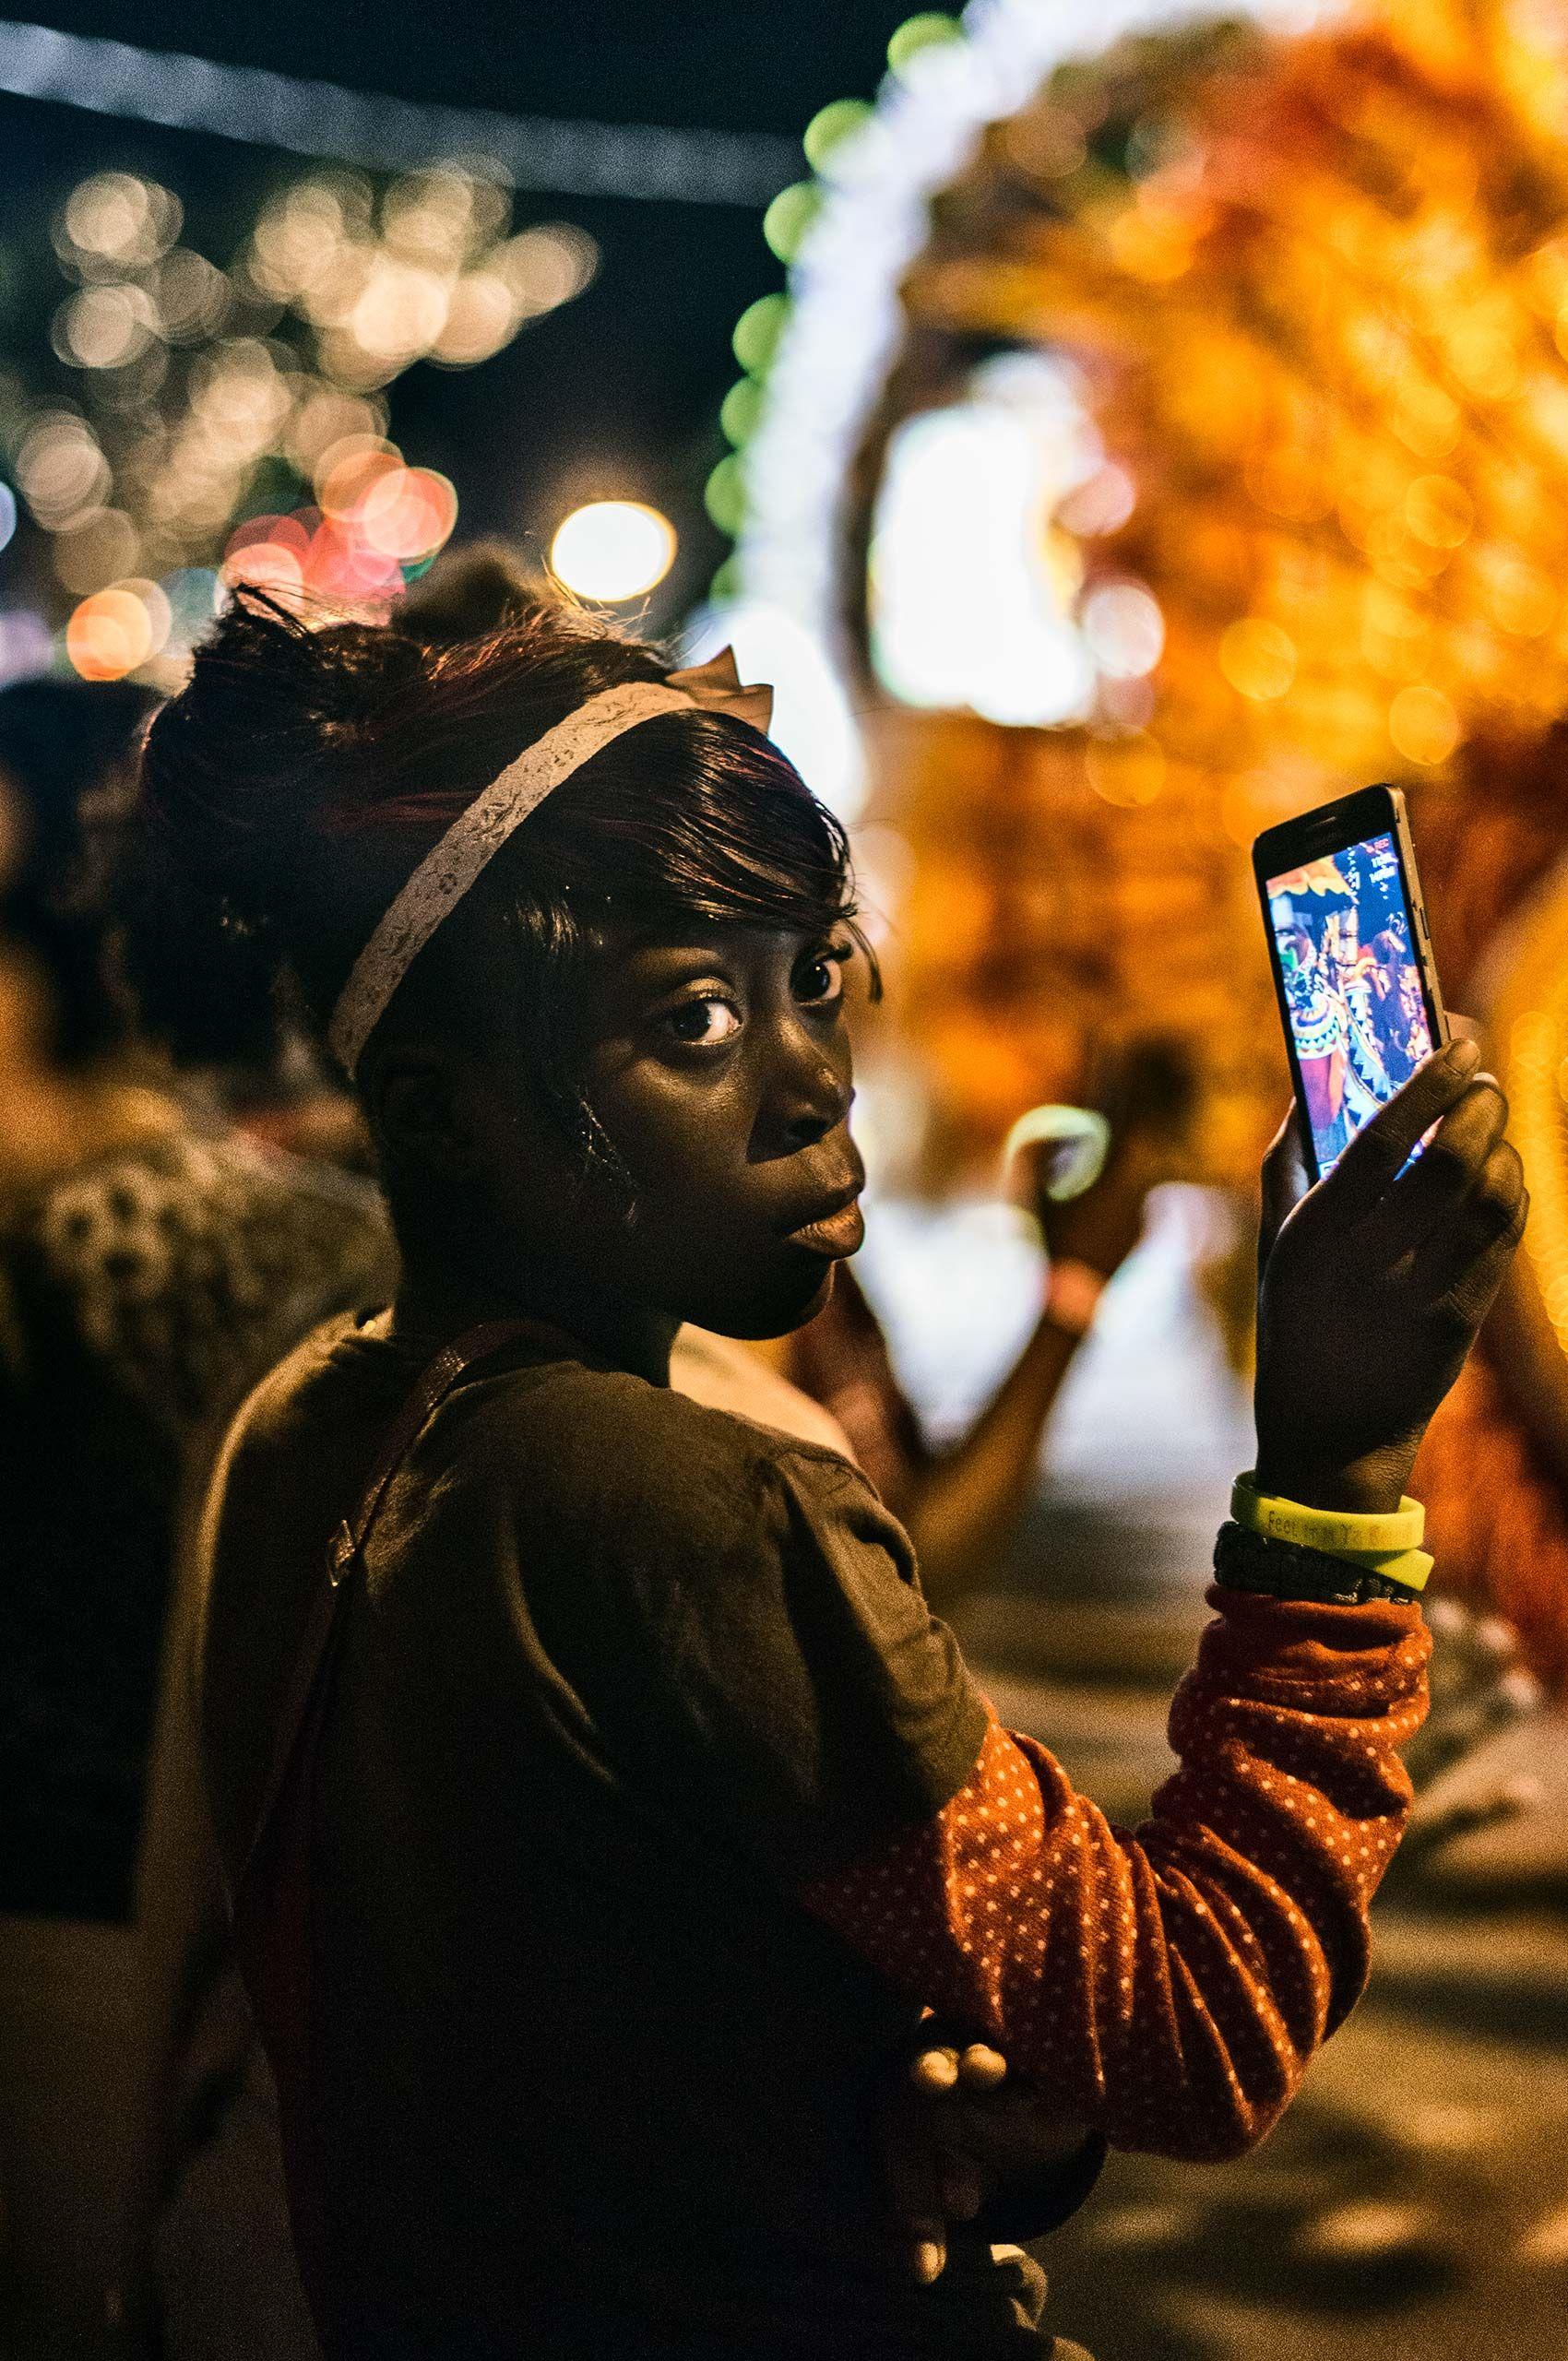 woman-with-cellphone-junkeroo-parade-harborisland-HenrikOlundPhotography.jpg